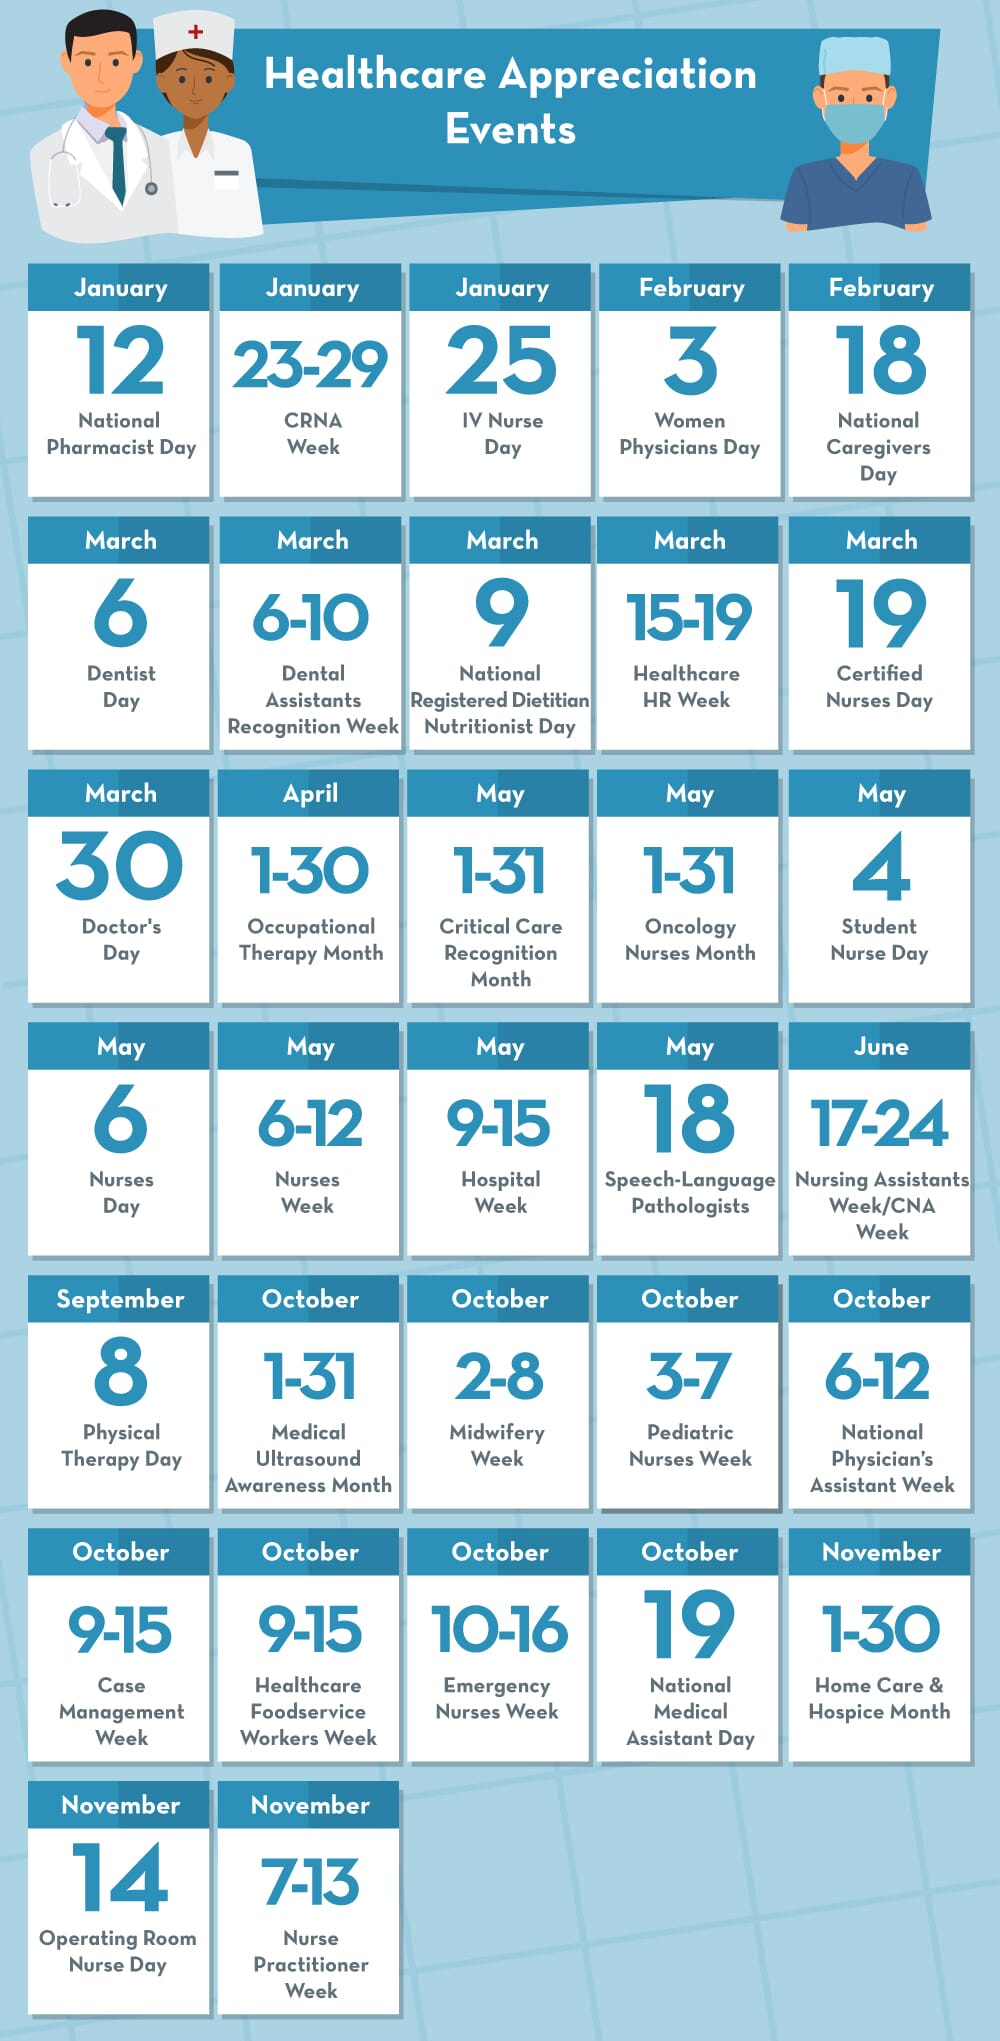 Healthcare appreciation holidays calendar